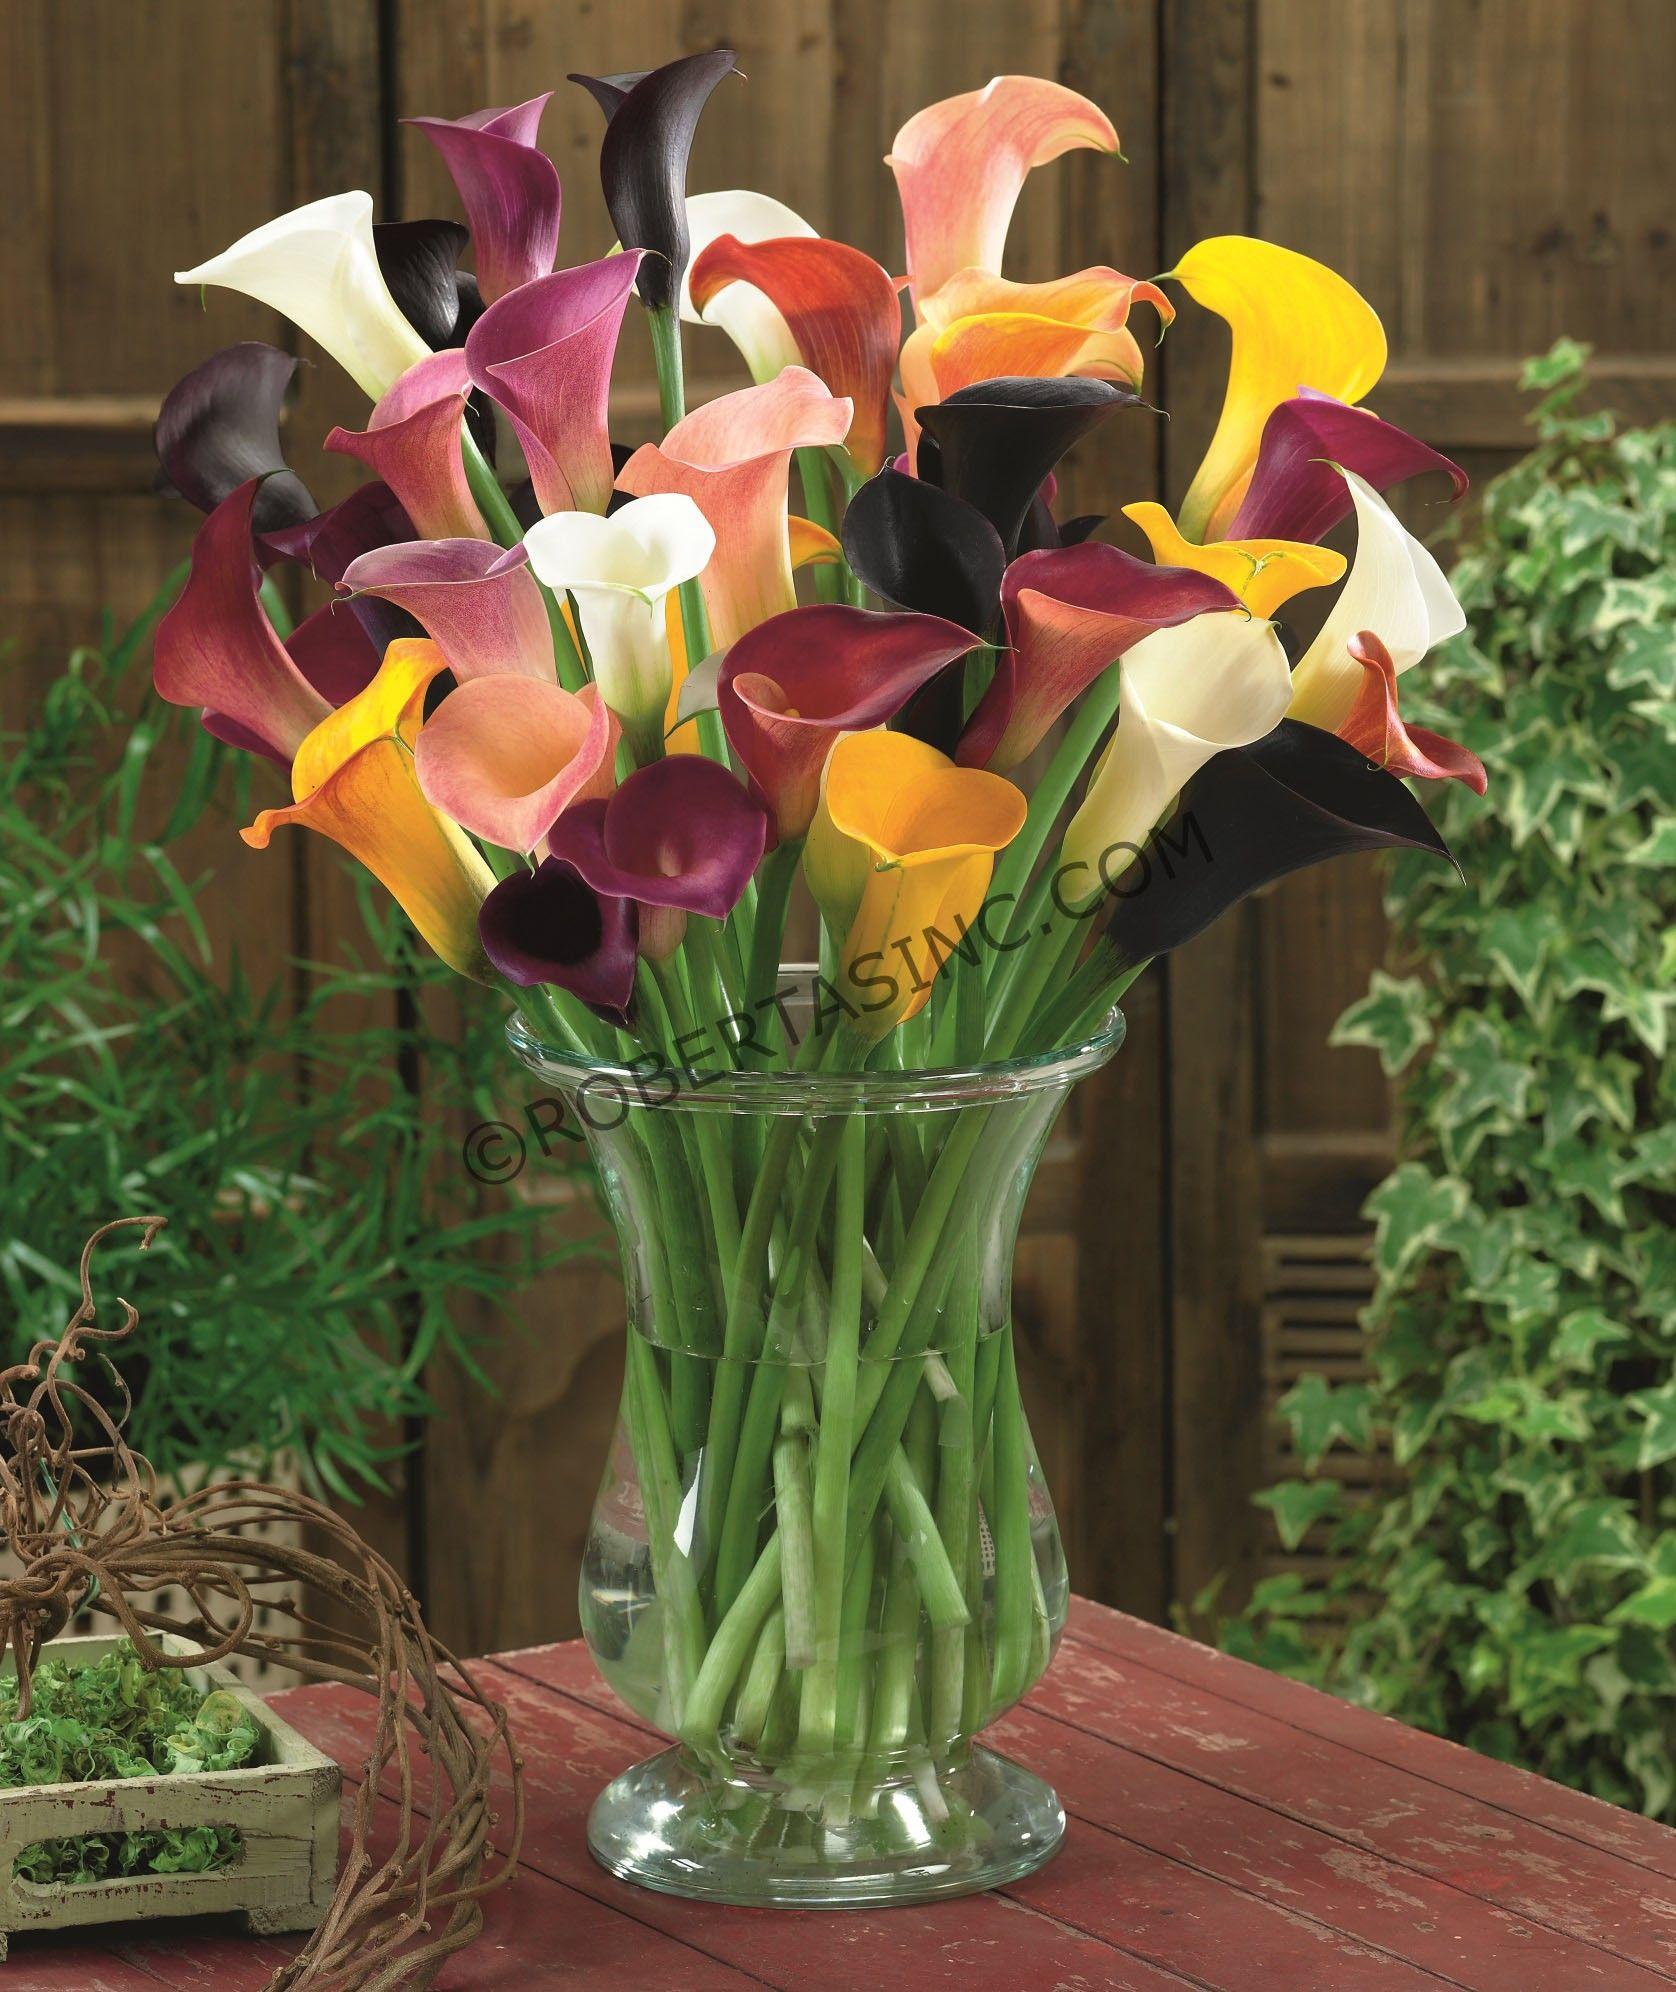 Image Result For Callas Flower Alcatras Amarillo Pinterest